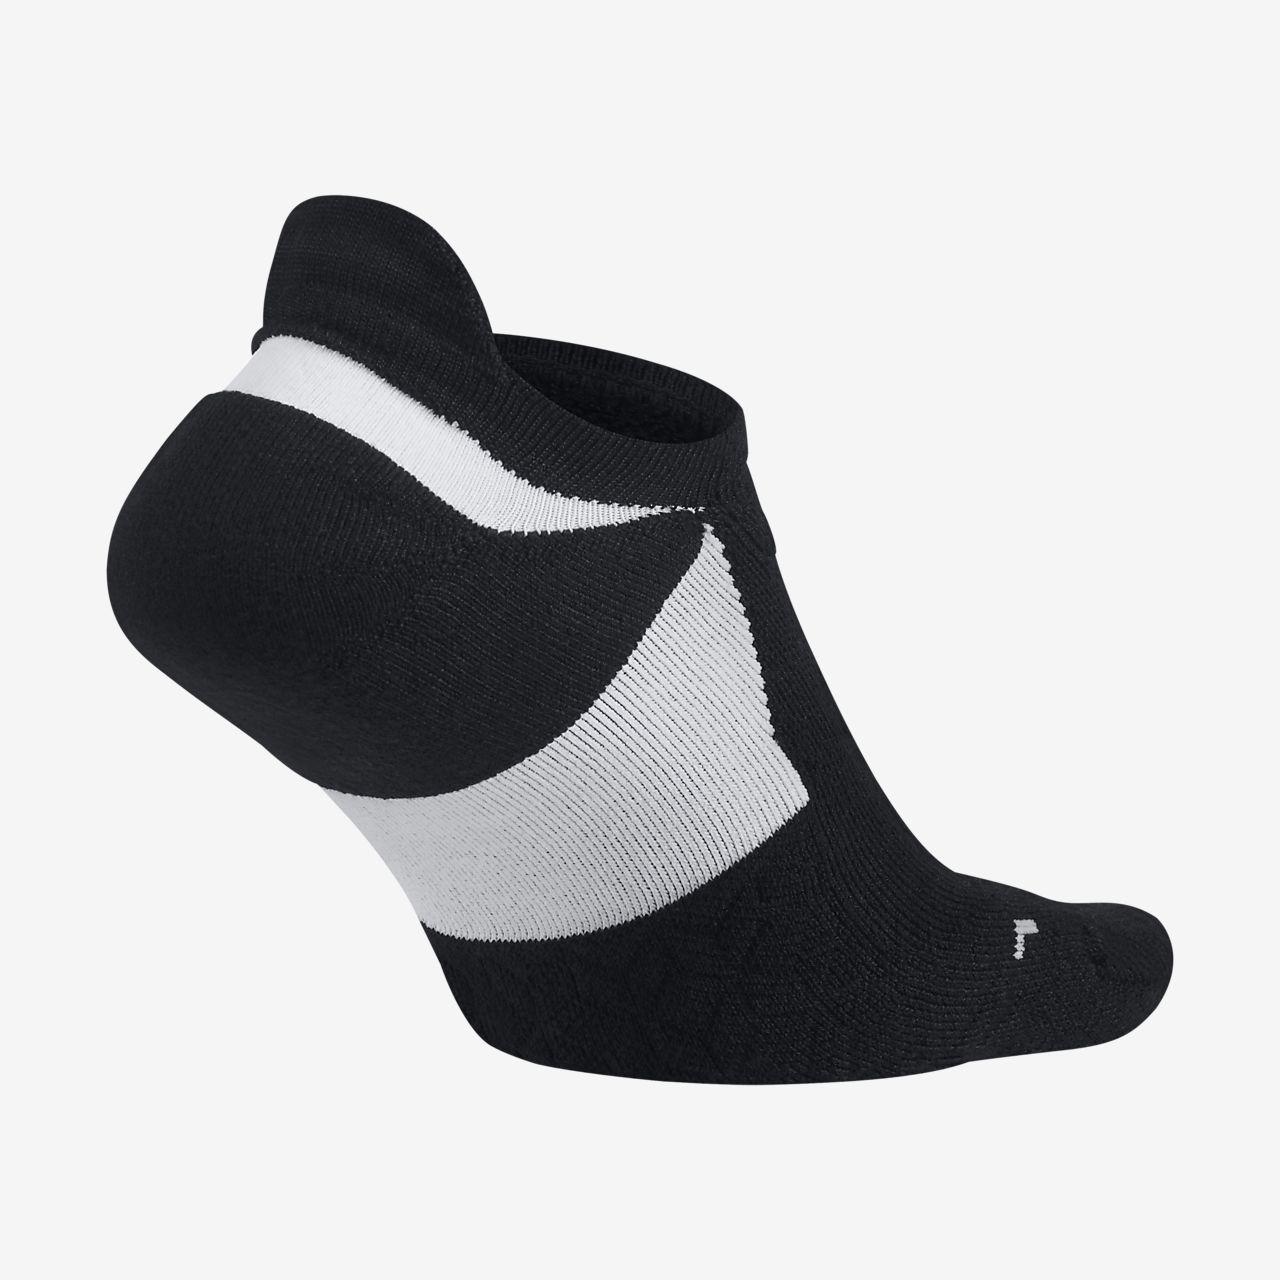 Nike Elite Cushioned No-Show-løbestrømper